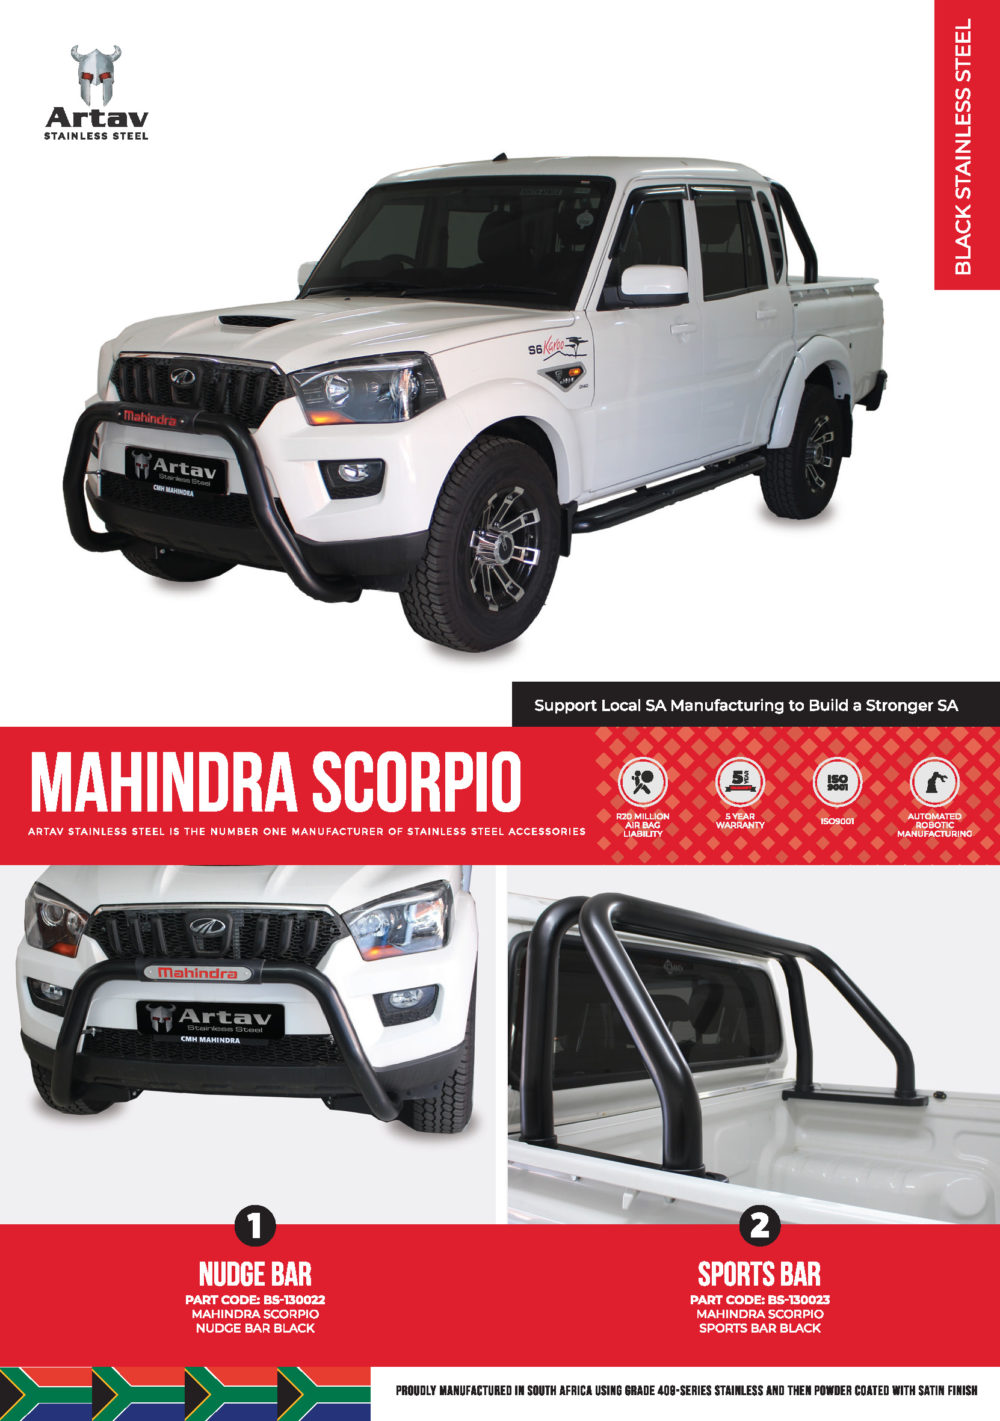 Mahindra Scorpio Nudge Bars, Roll Bars/Sports Bars and Side Steps